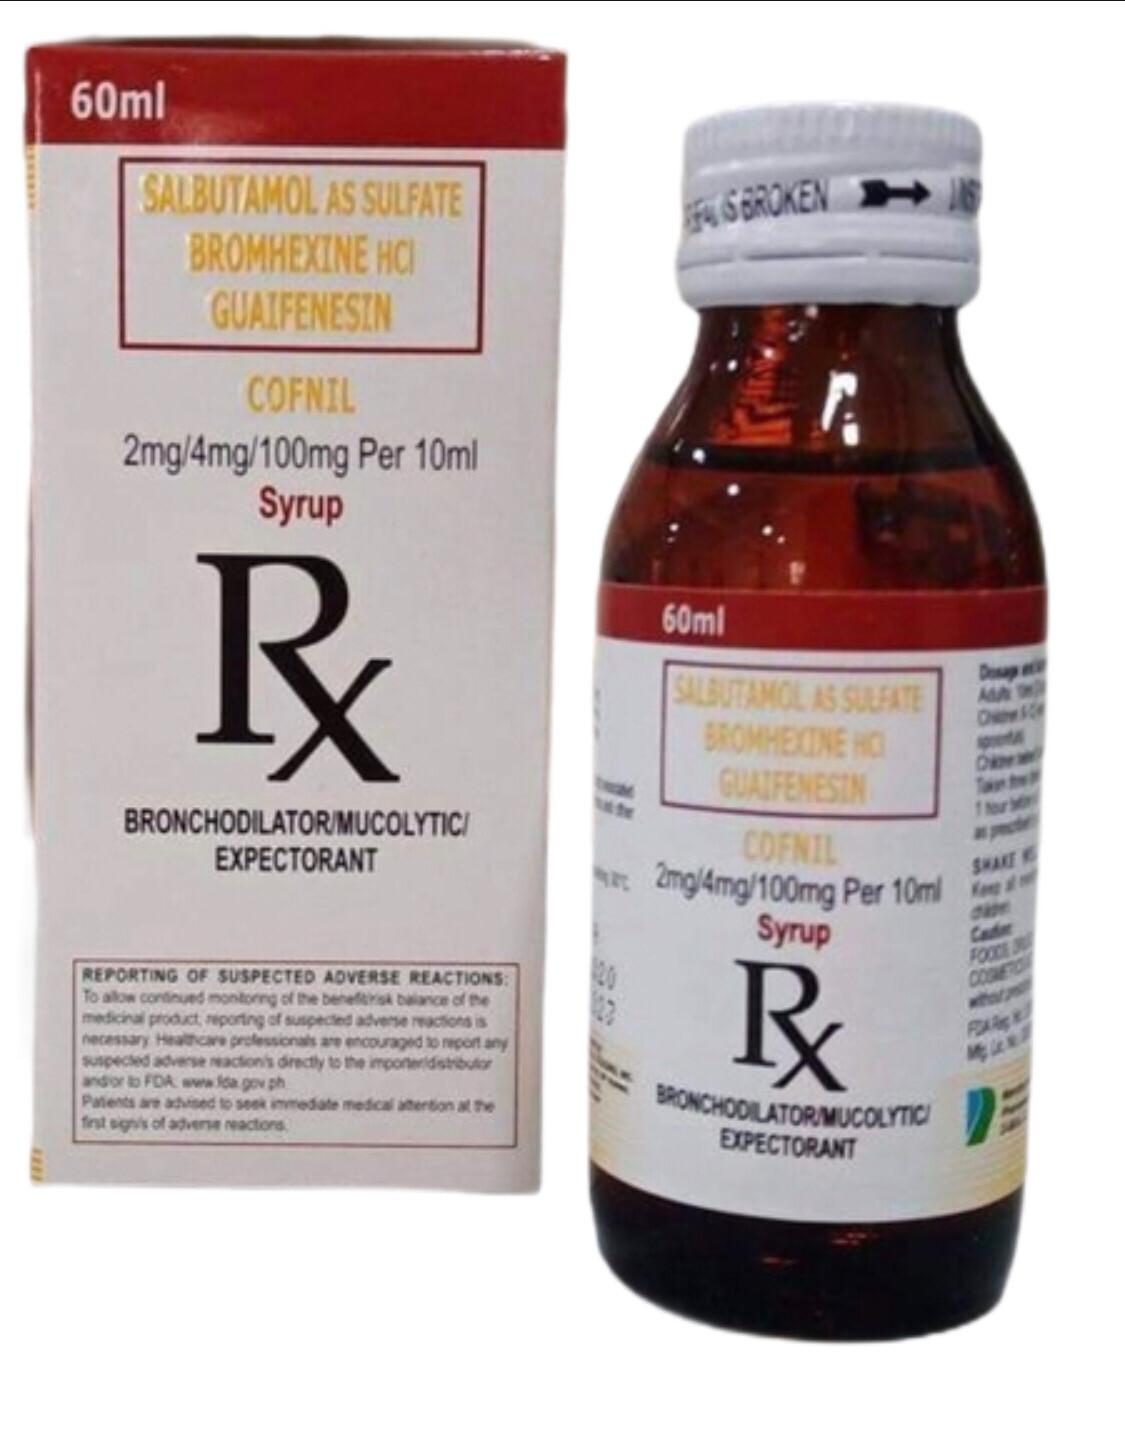 Salbutamol + Bromhexine HCl+ Guiafenesin 2mg/4mg/100mg per 10ml Syrup